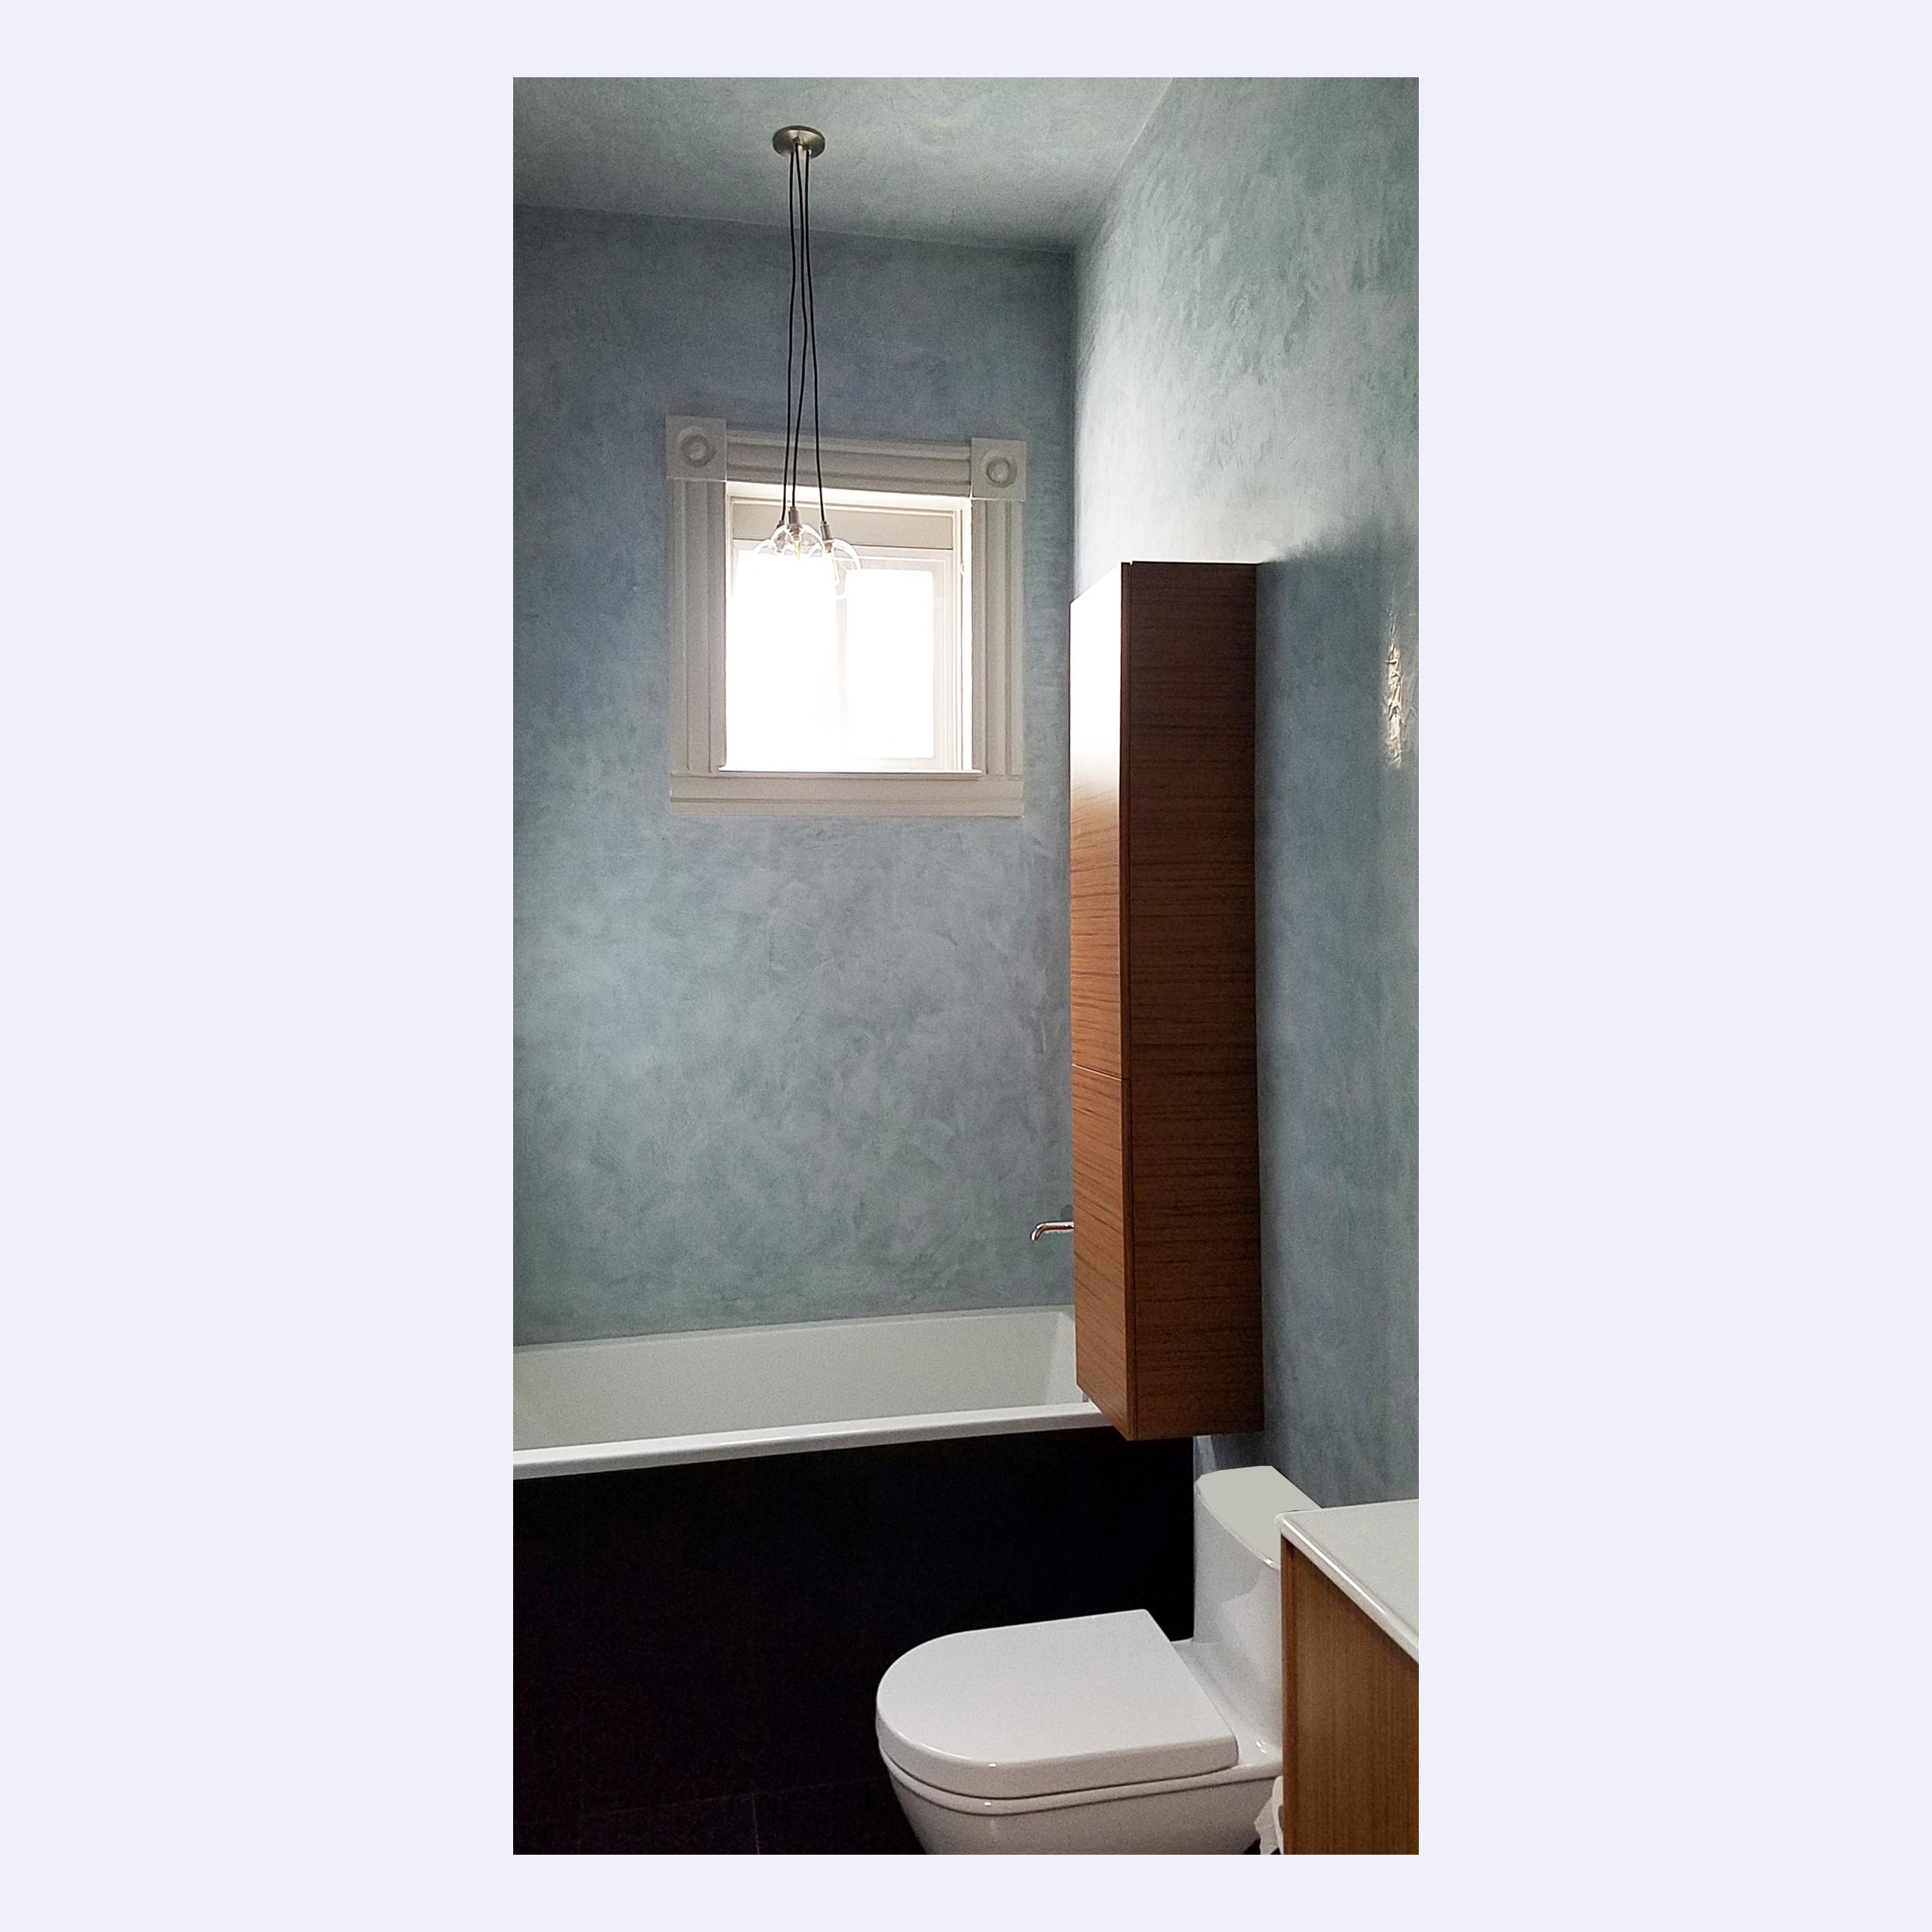 1_Bathroom.jpg